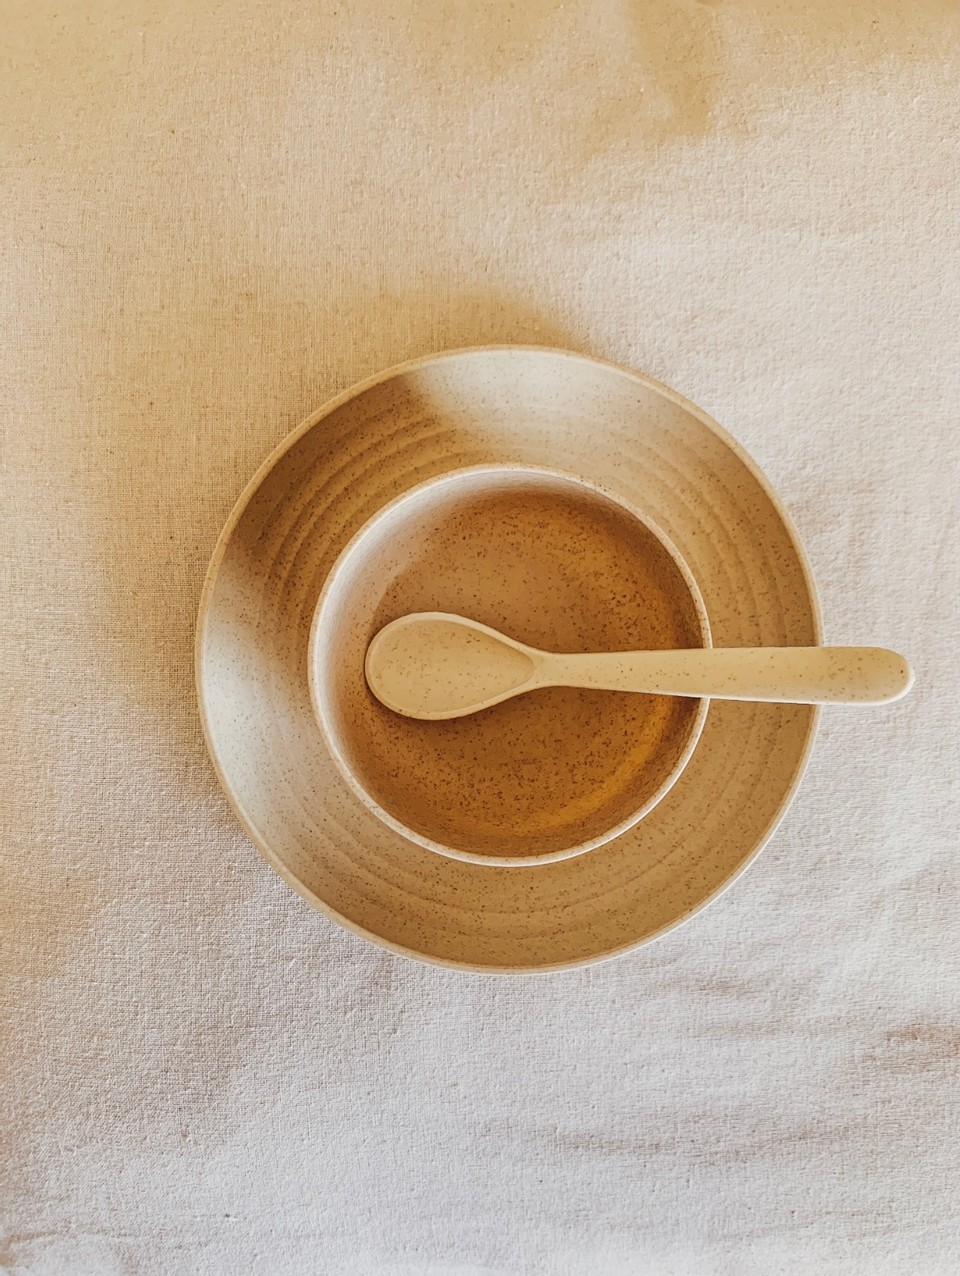 wheatstraw dinner set